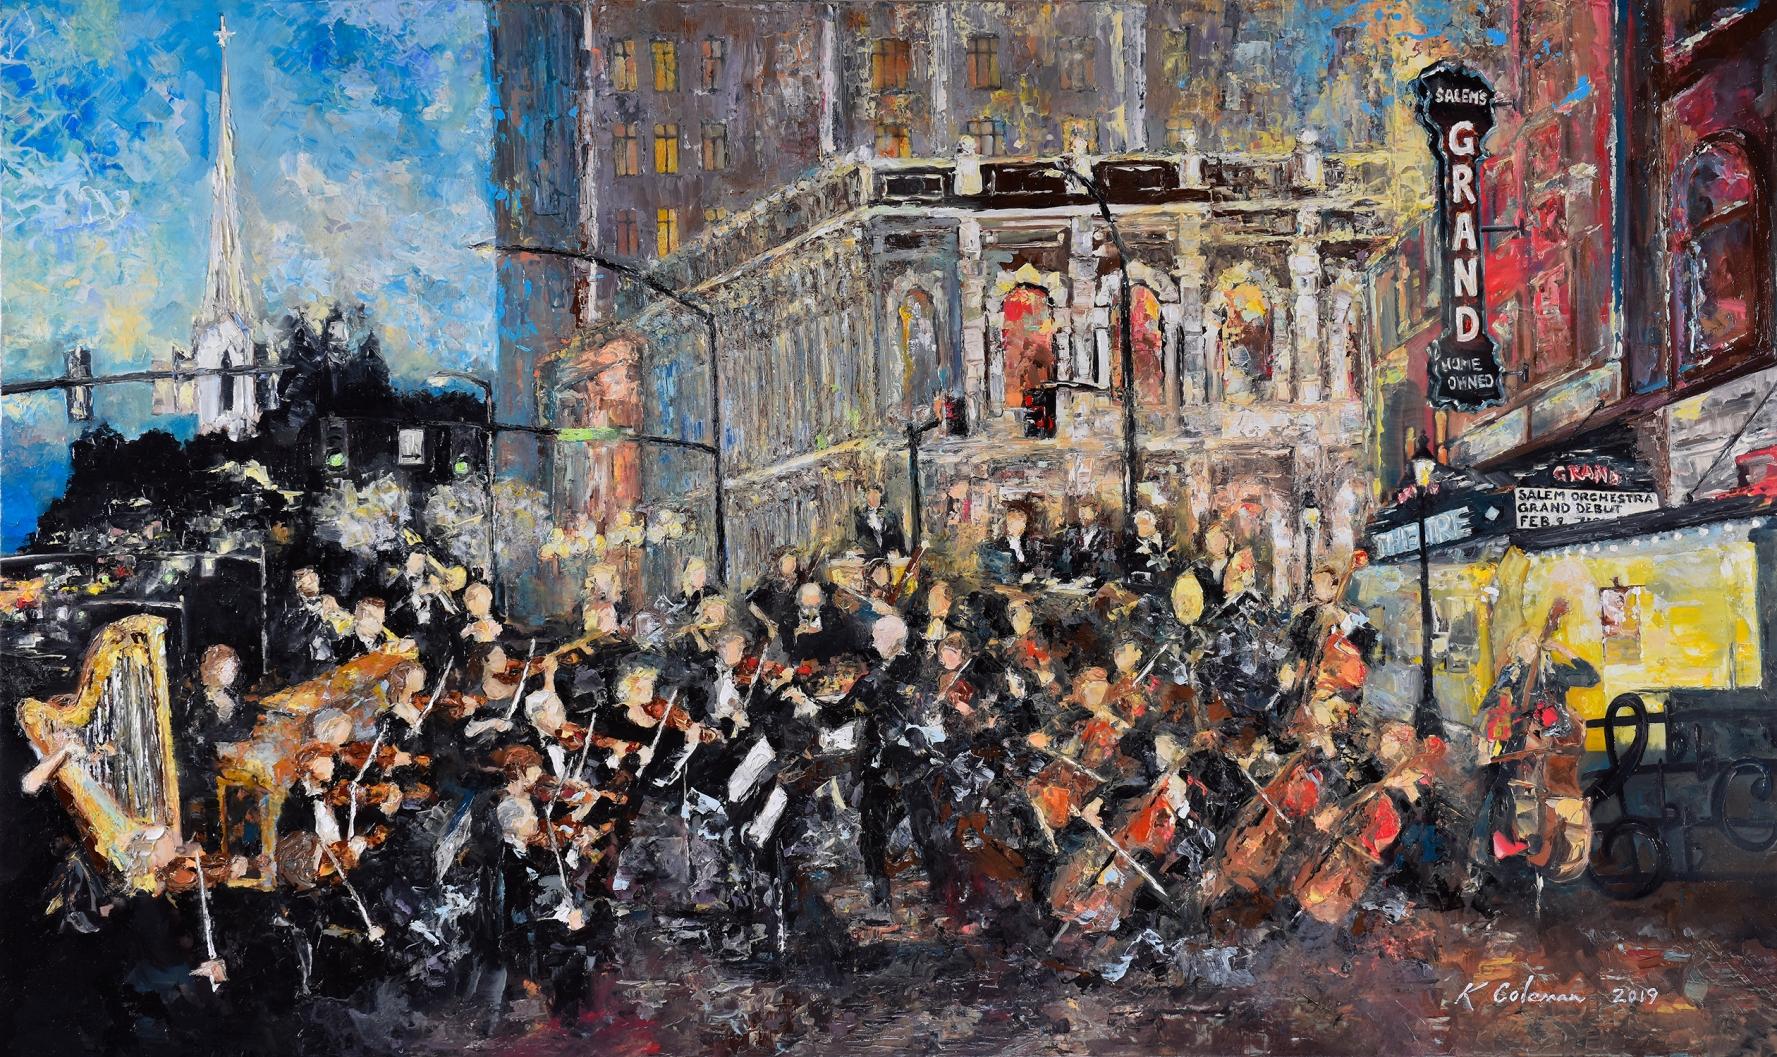 Salem Orchestra 2019 014 w